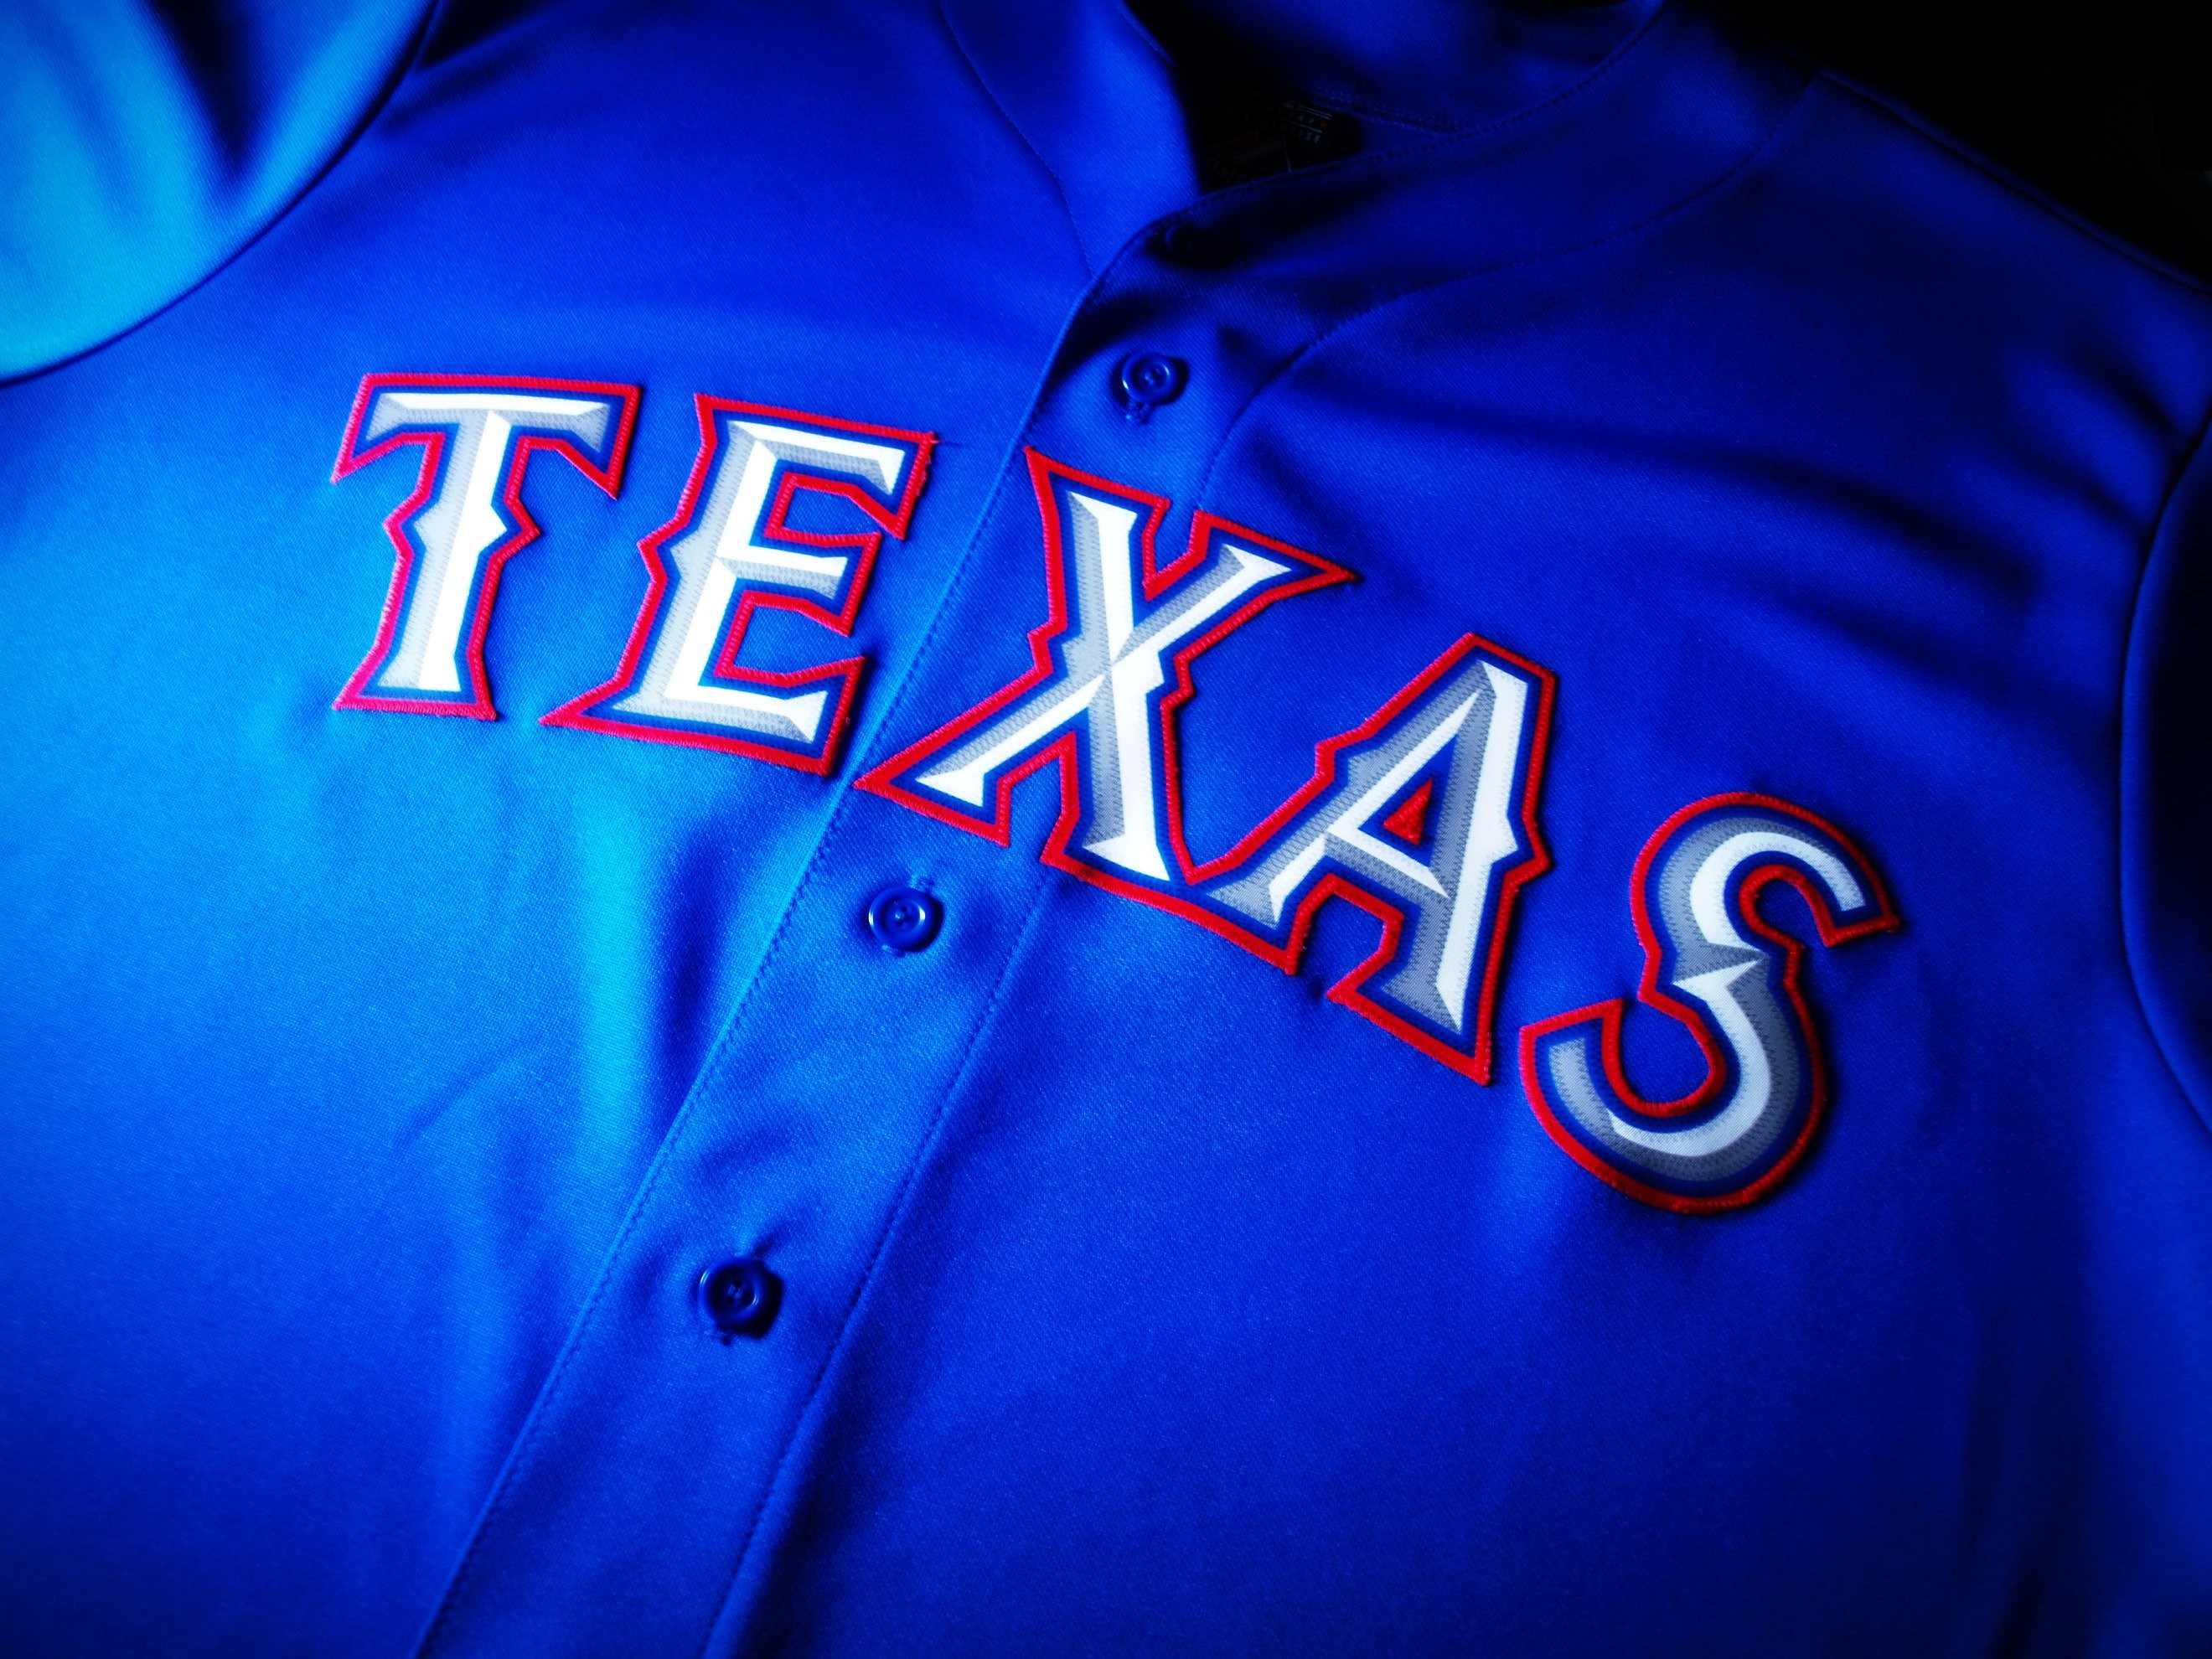 Texas Rangers Desktop Wallpaper Collection